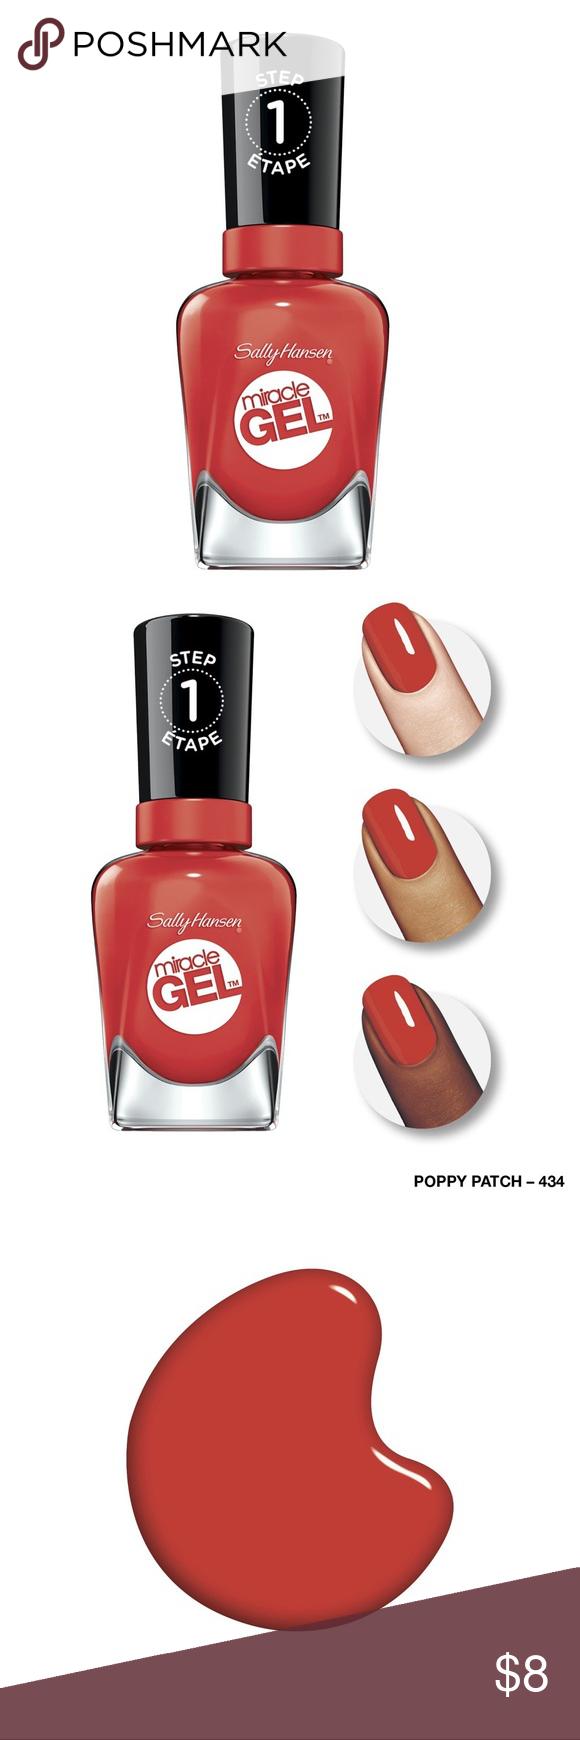 BNWT Sally Hansen Gel Nail Polish in Poppy Patch Brand New